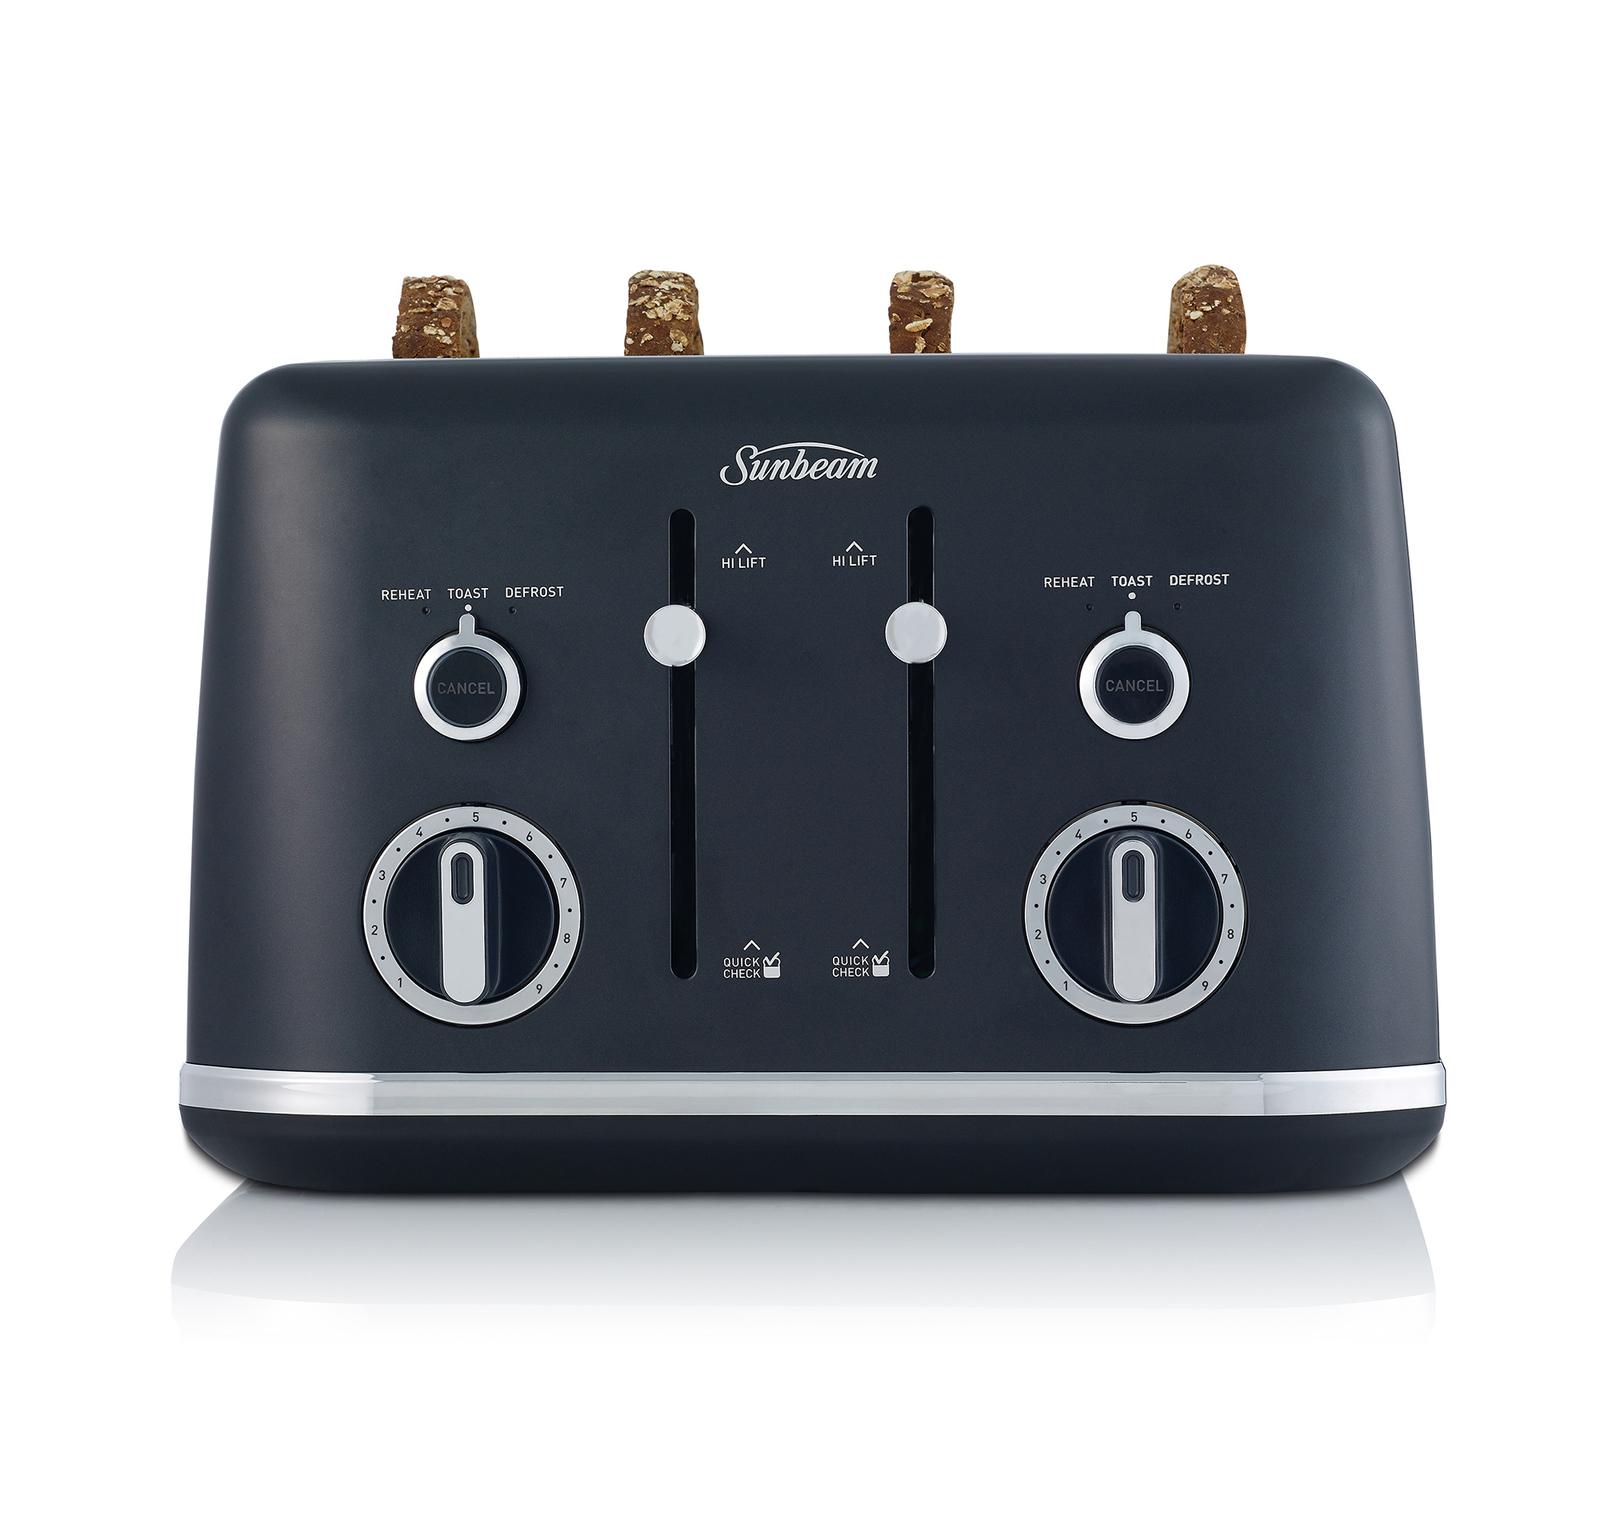 Sunbeam: Gallerie Collection 4 Slice Toaster - Midnight Black image